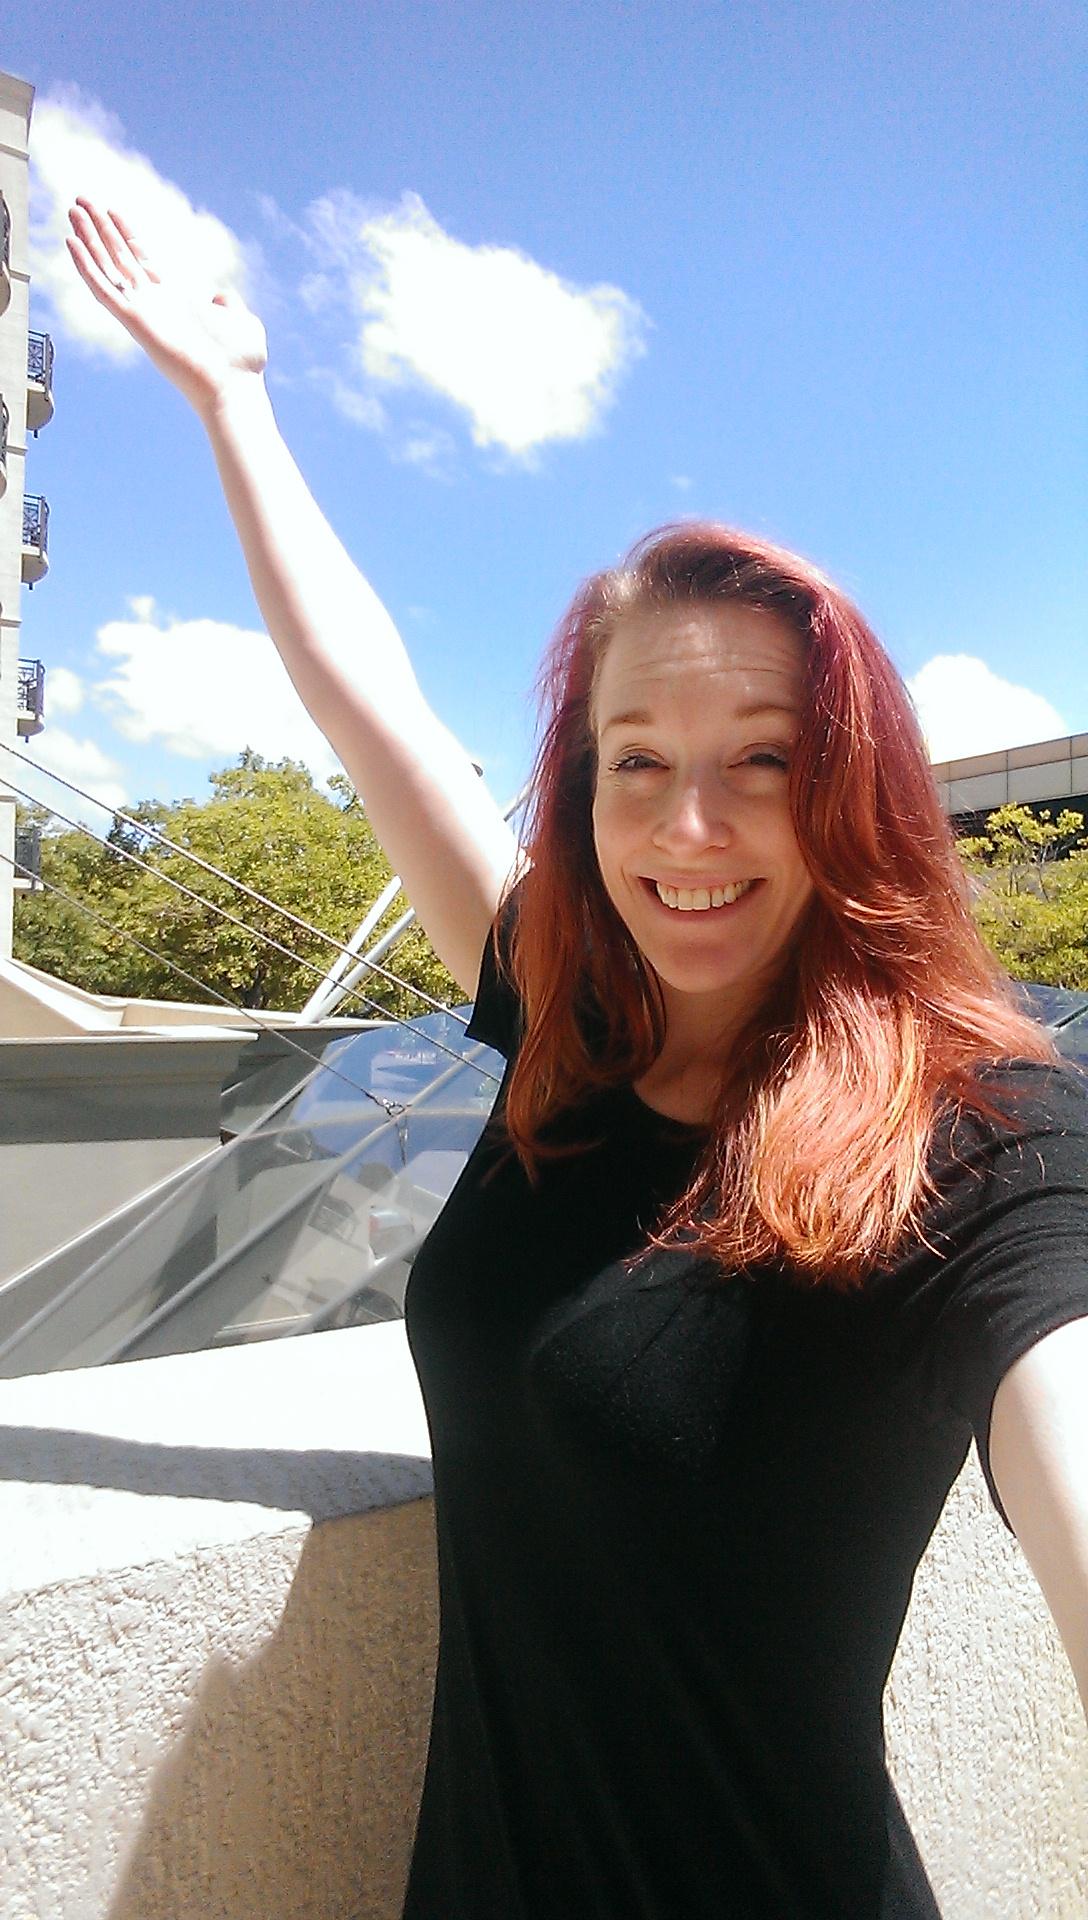 Made it to Australia!